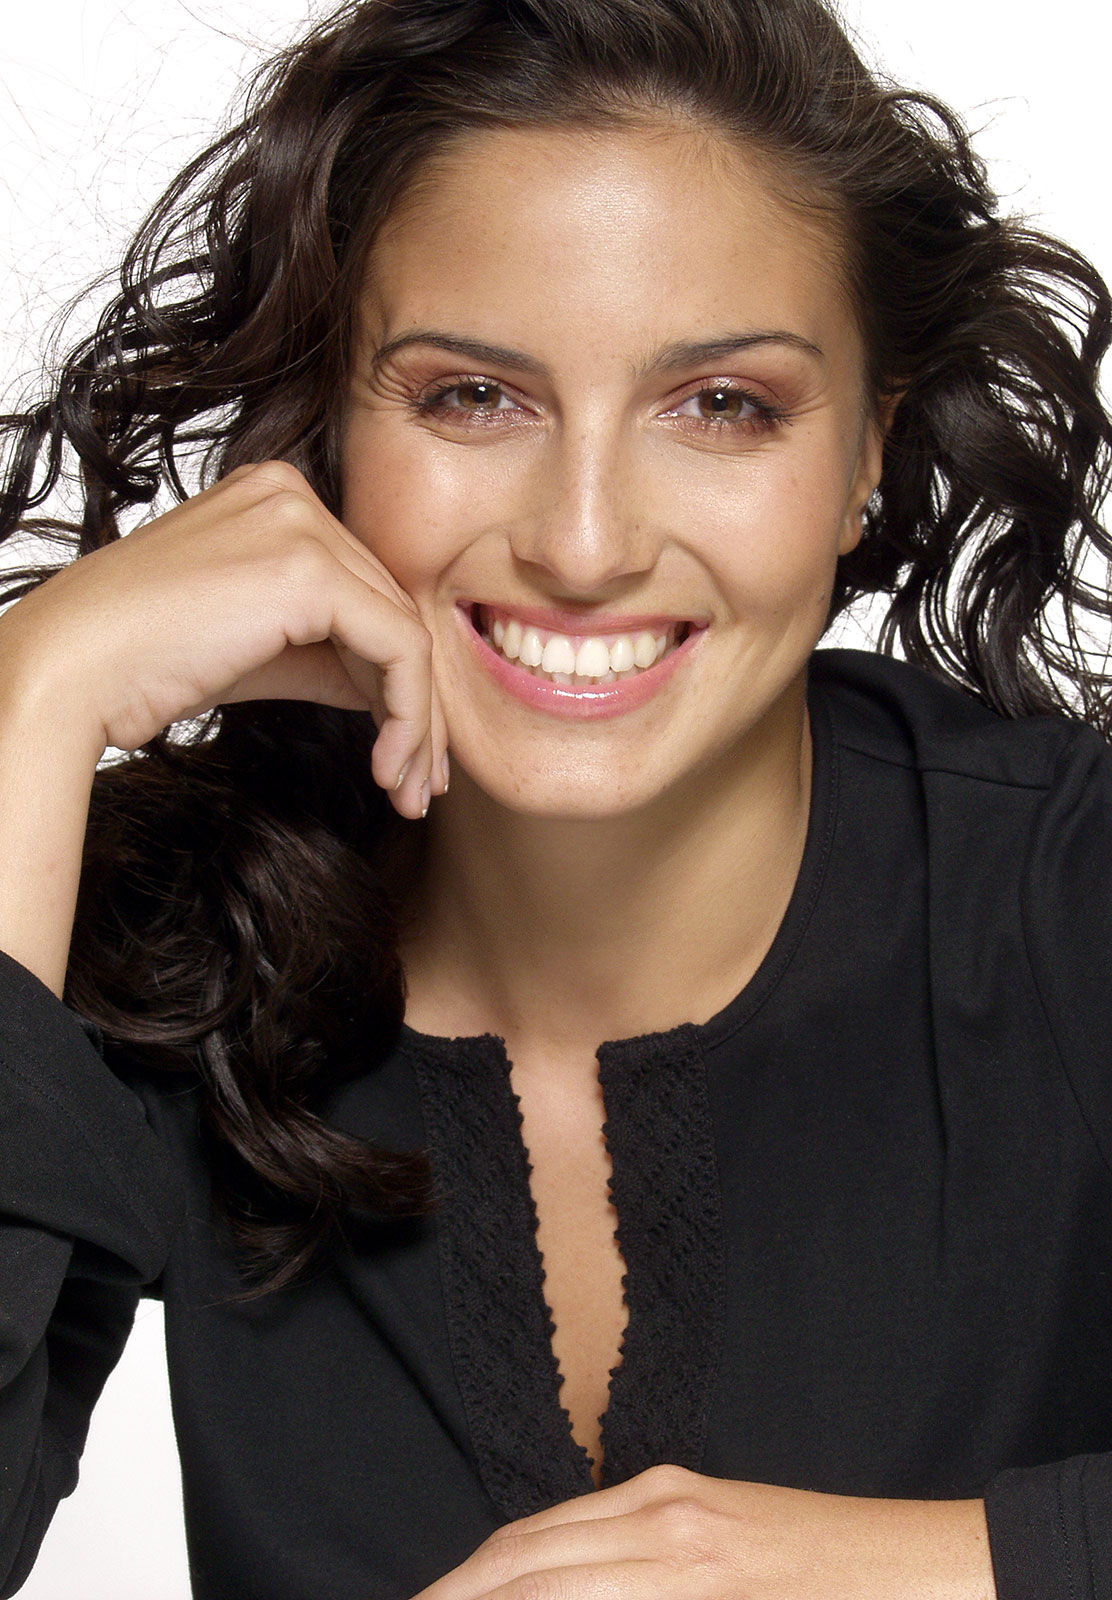 Lucia Siposova stars photo 4